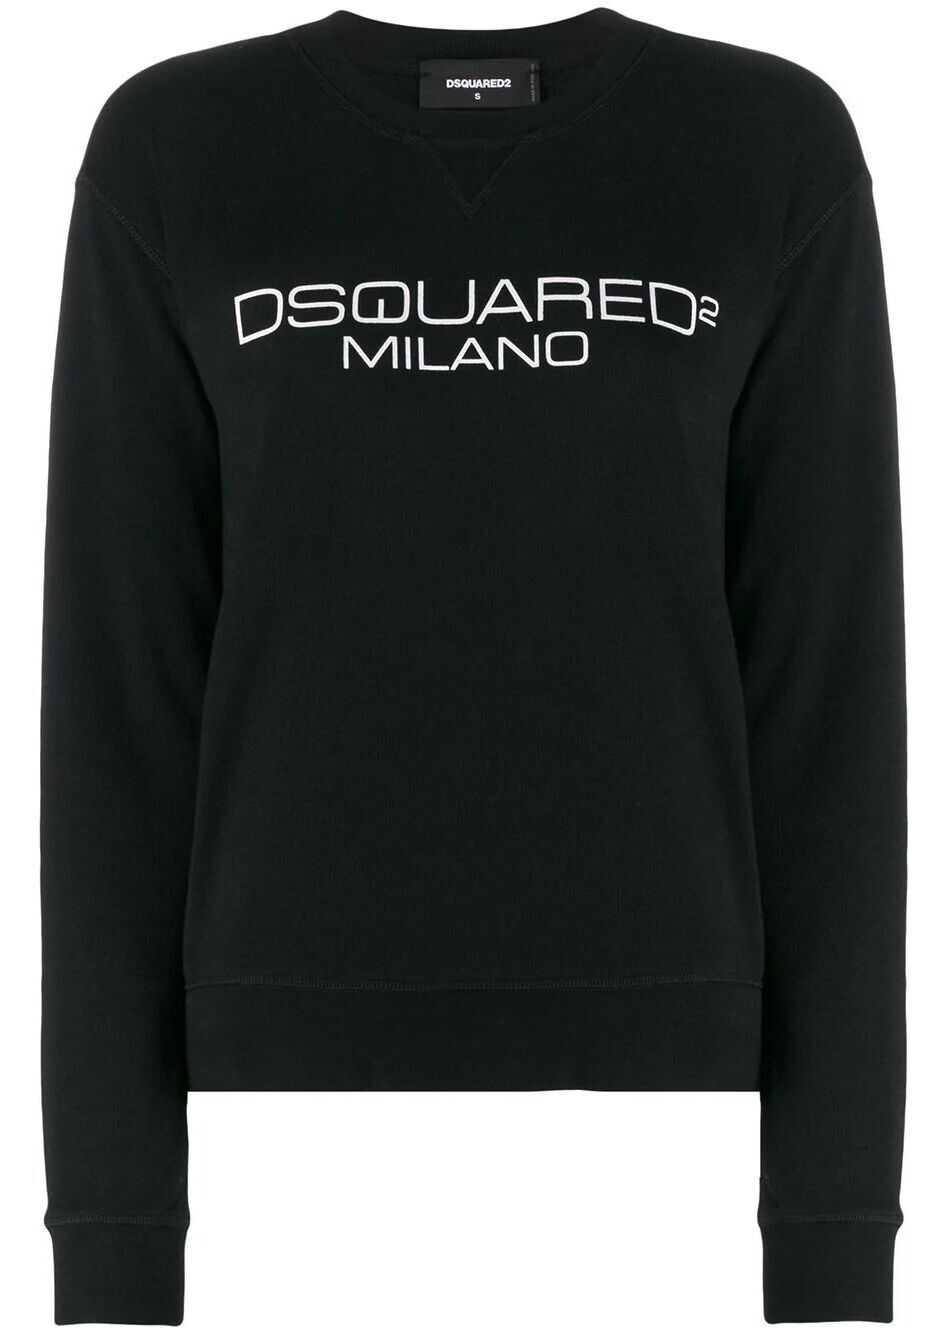 DSQUARED2 Cotton Sweatshirt BLACK